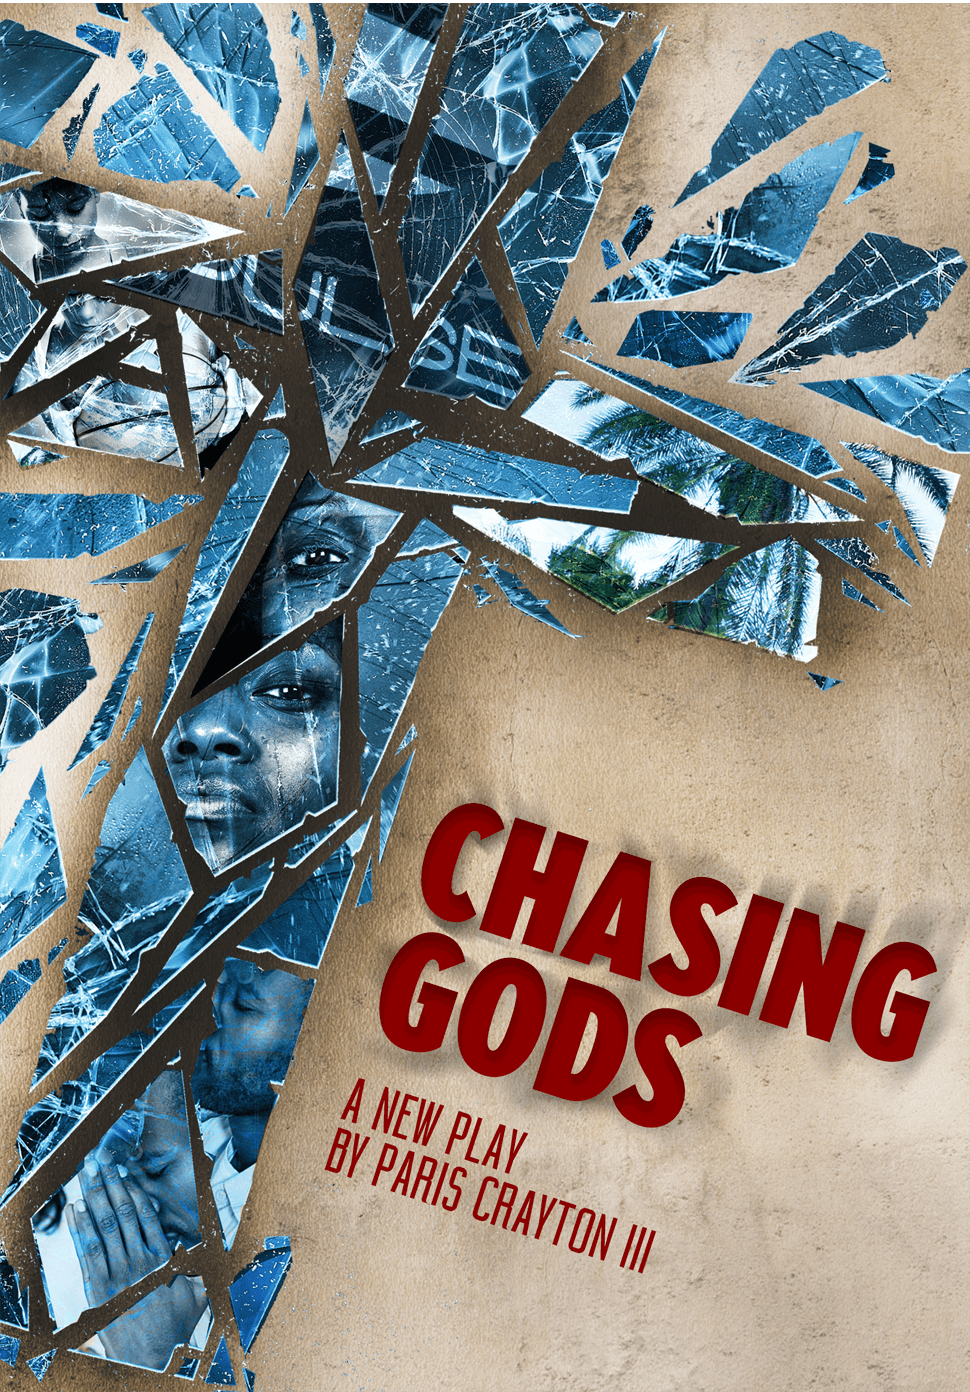 NYRep - Chasing Gods Poster MC1.png